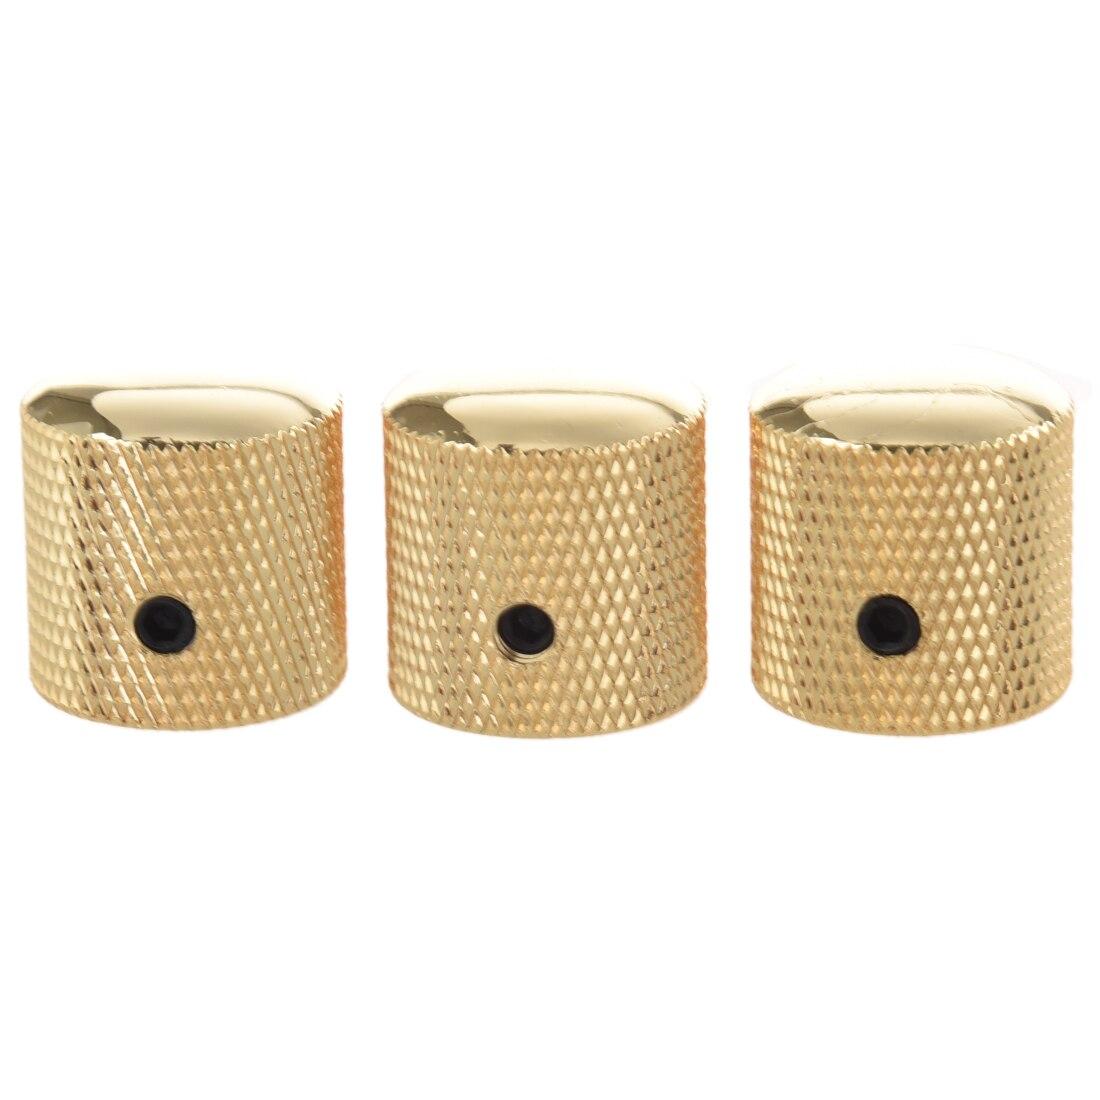 все цены на 12pcs (3PCS Gilded Metal Dome Knobs Knurled Barrel for Electric Guitar Parts Gold